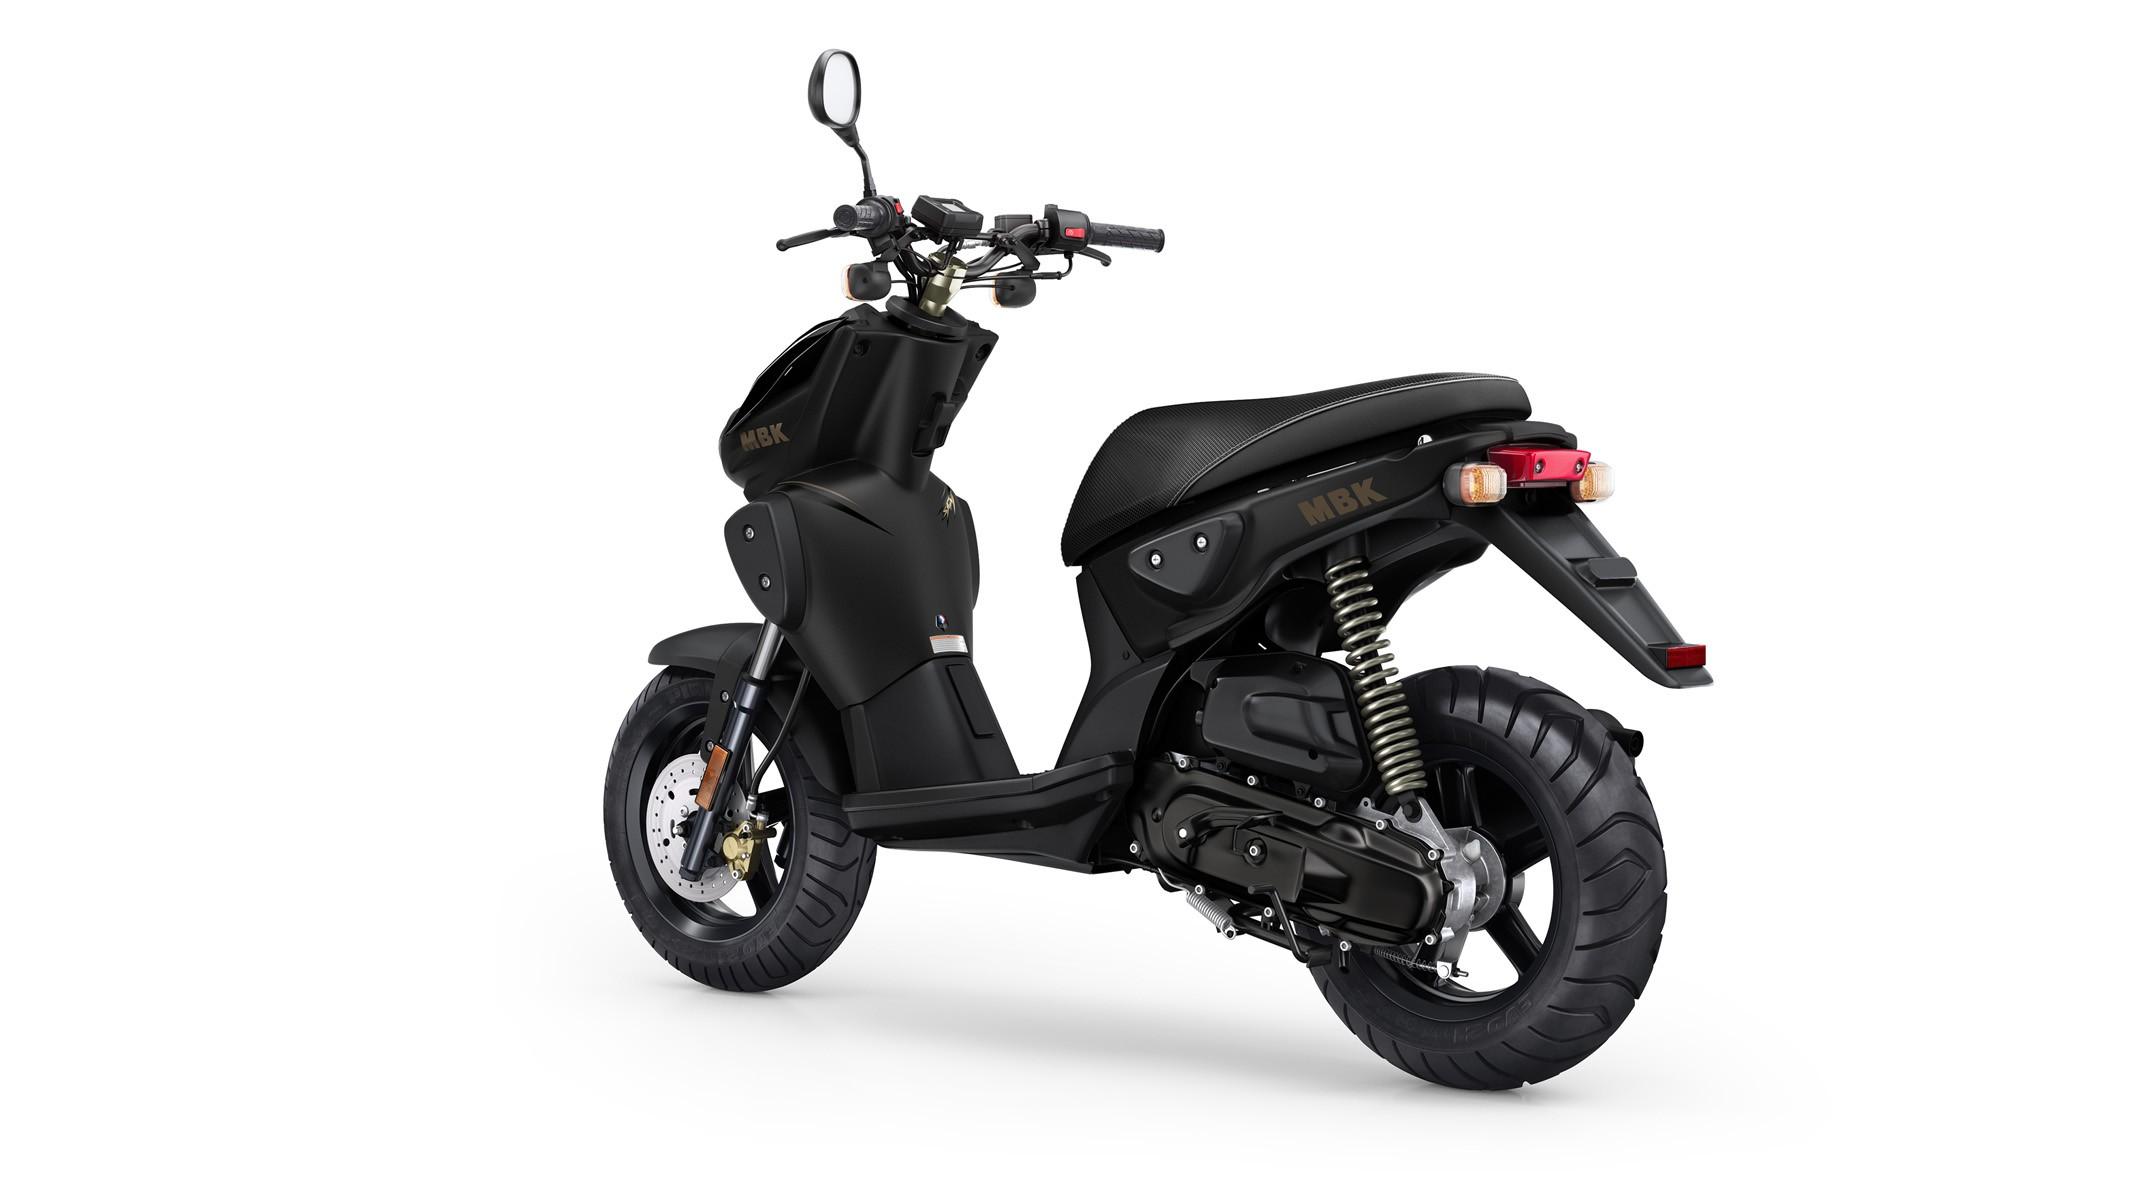 2009 MBK Stunt Naked - Moto.ZombDrive.COM